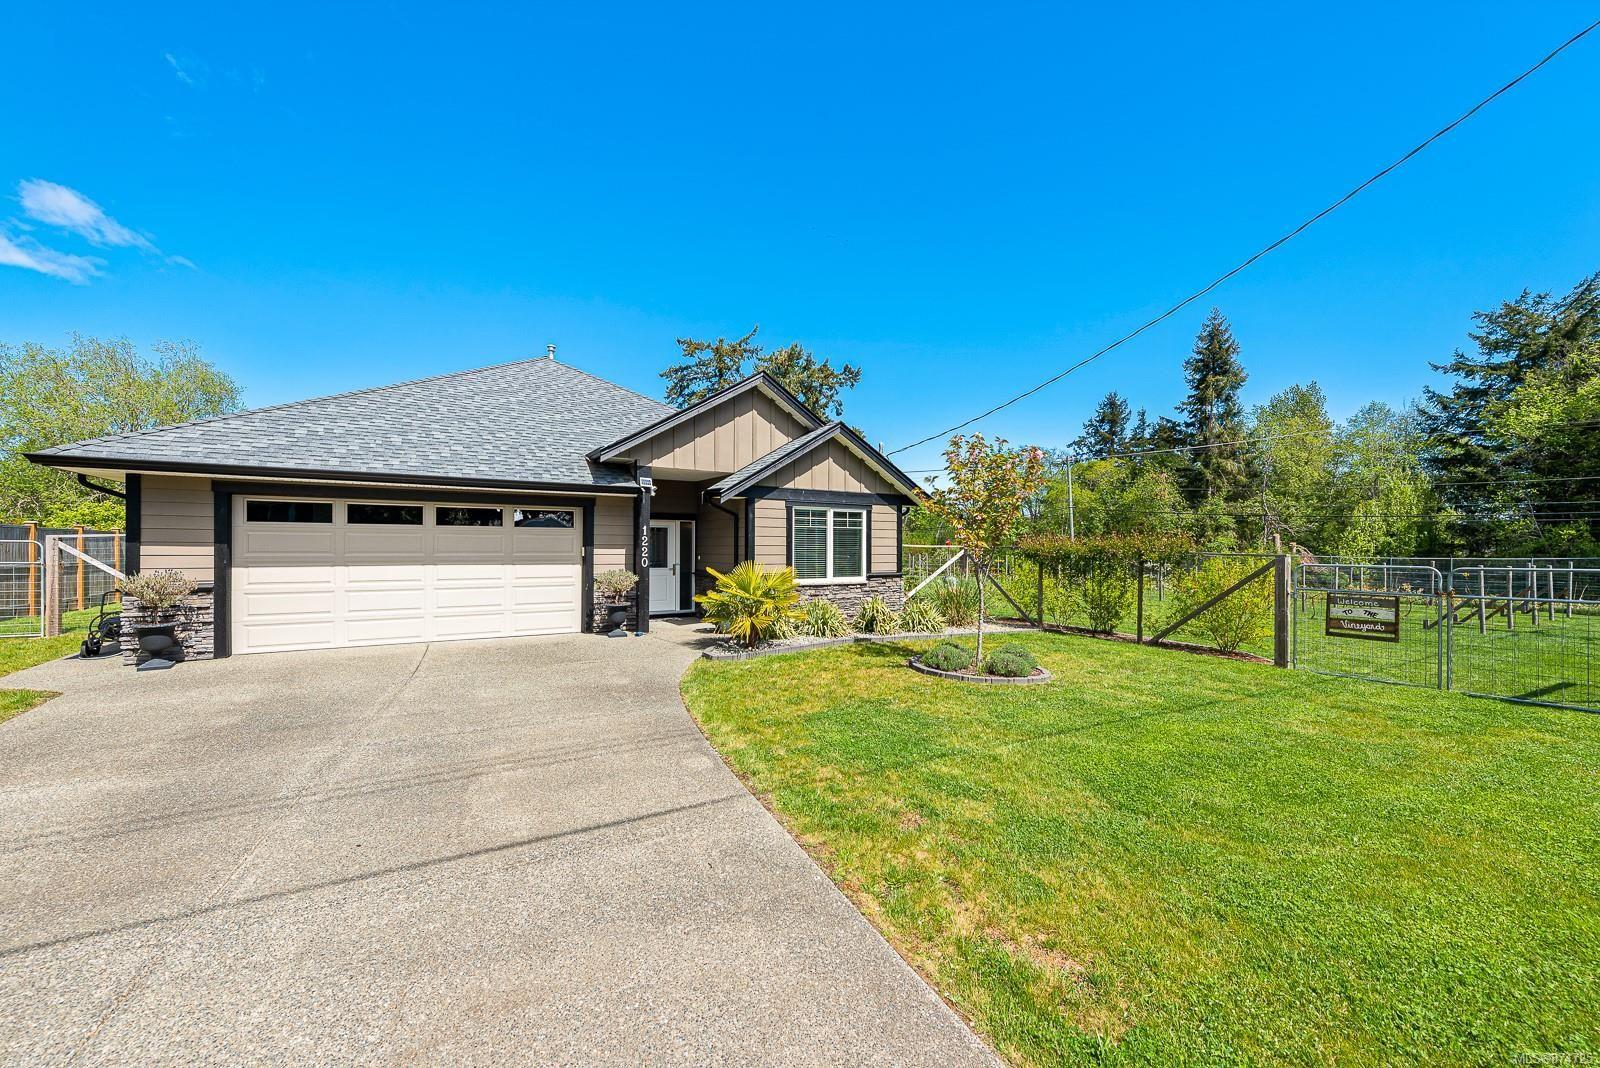 Main Photo: 1220 Foden Rd in : CV Comox Peninsula House for sale (Comox Valley)  : MLS®# 874725